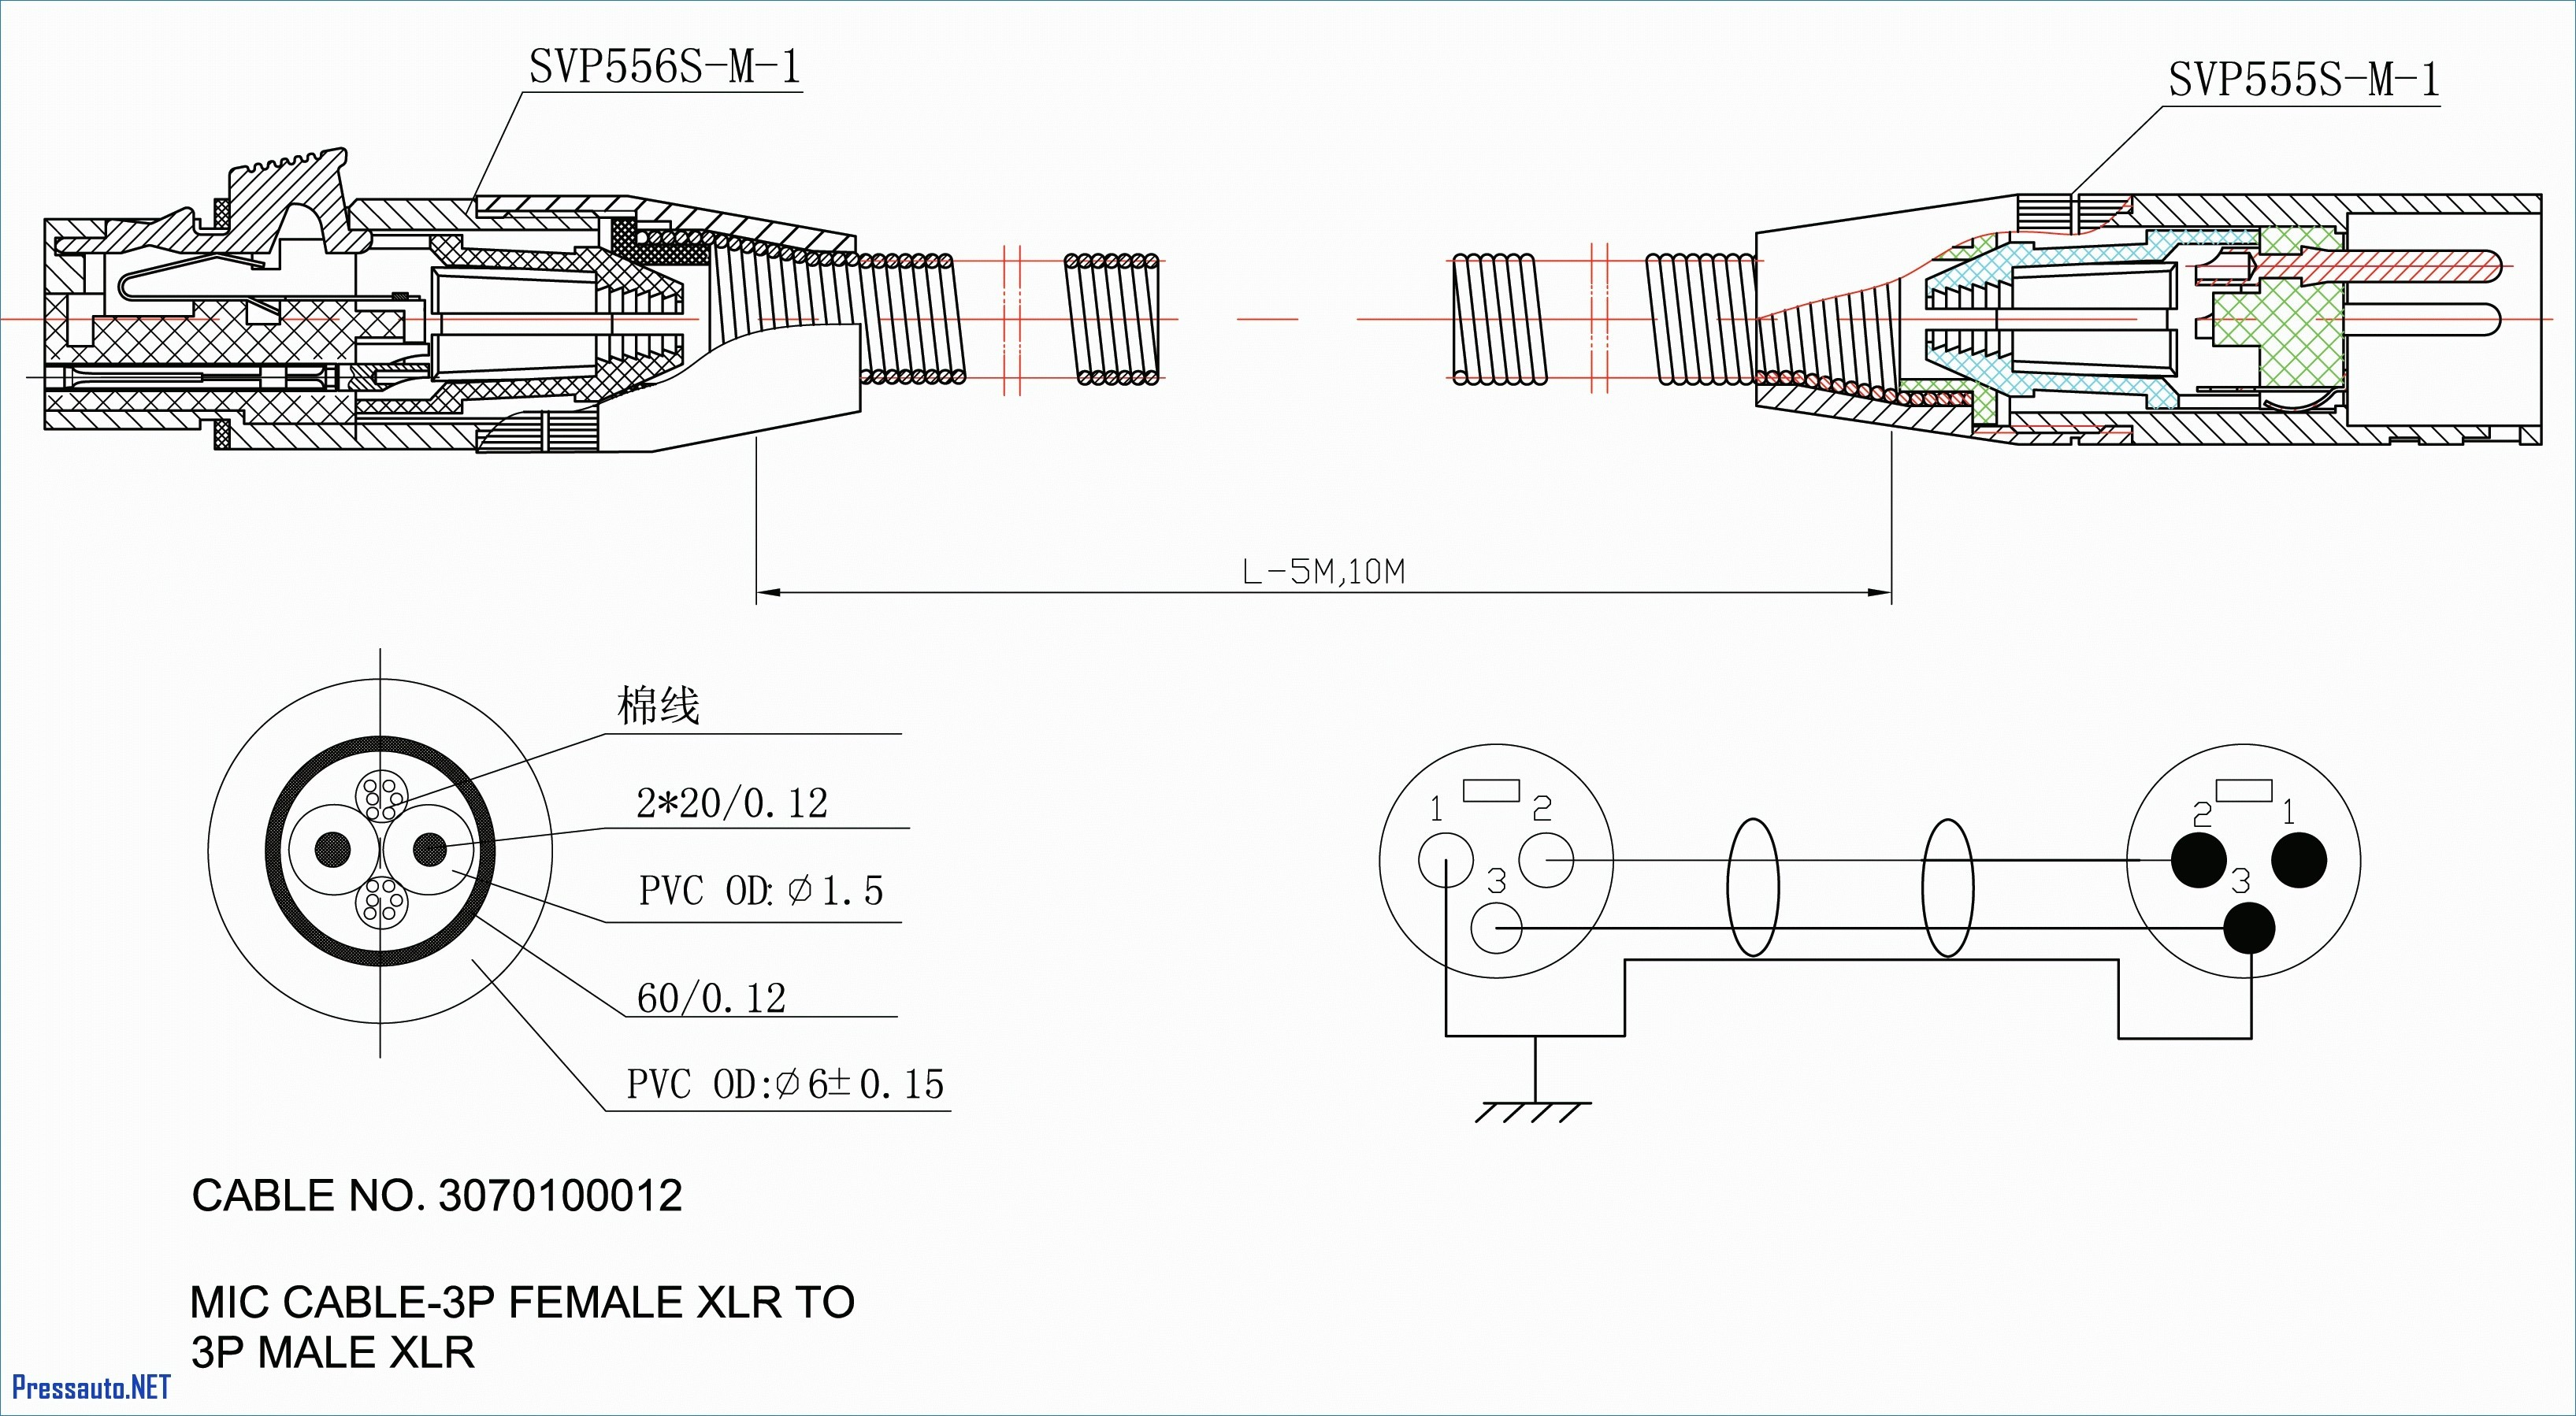 1 Cylinder Engine Diagram Vw Tdi Engine Diagram Another Blog About Wiring Diagram • Of 1 Cylinder Engine Diagram